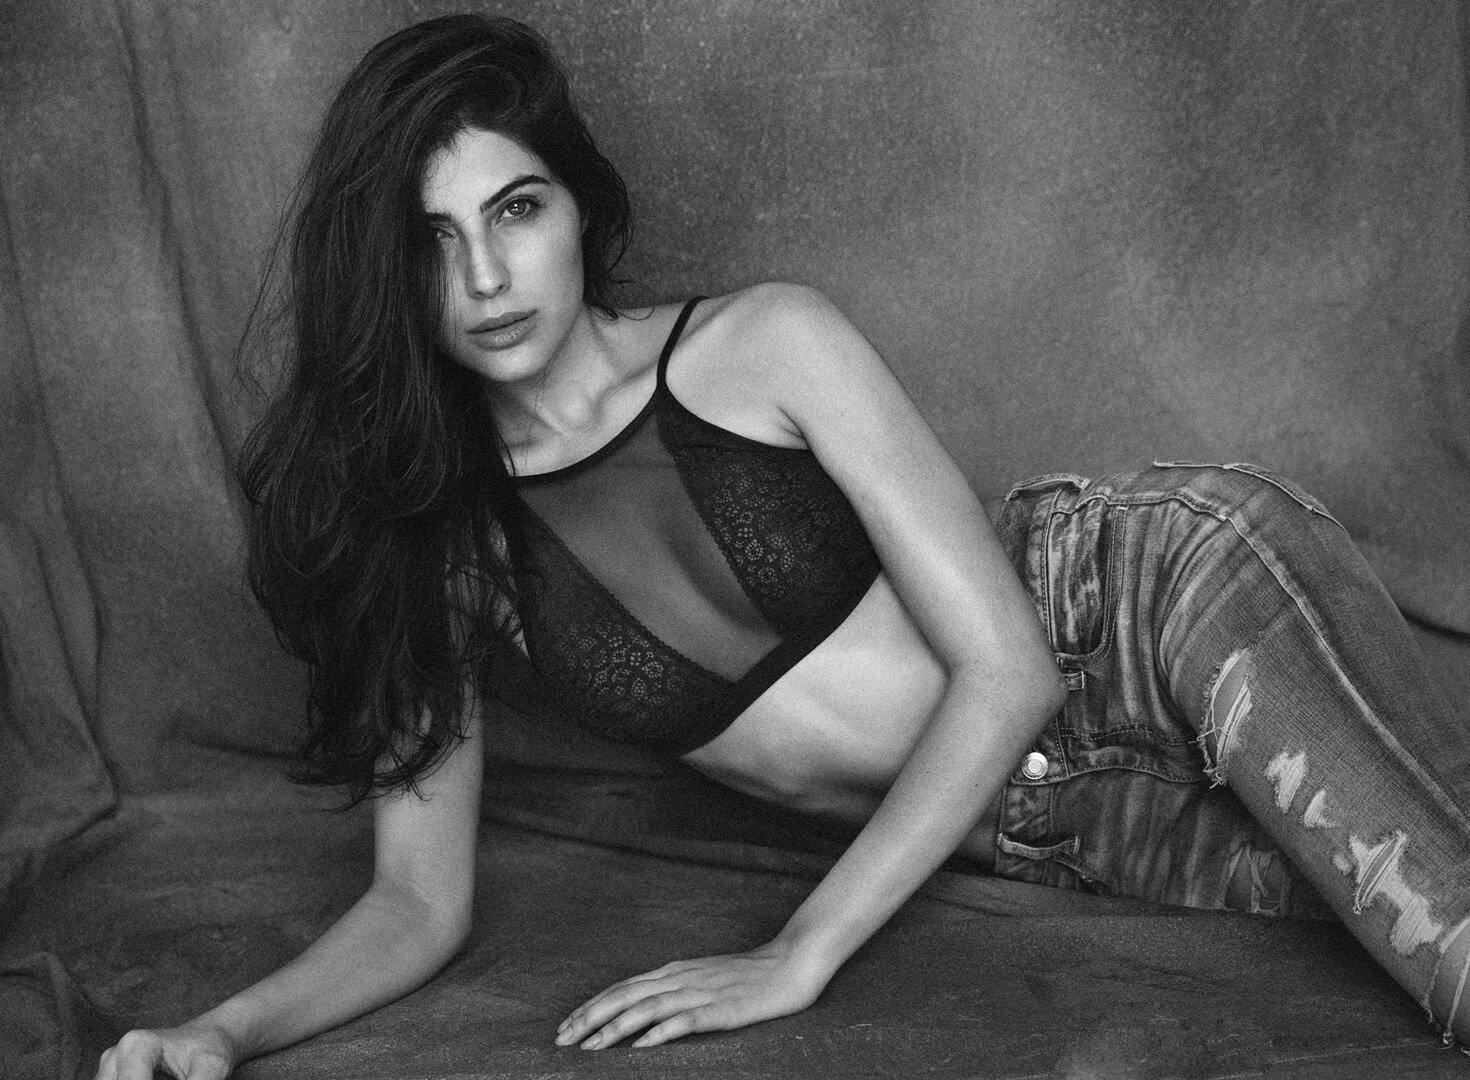 Elnaaz Norouzi Modelling Black Lingerie Denim